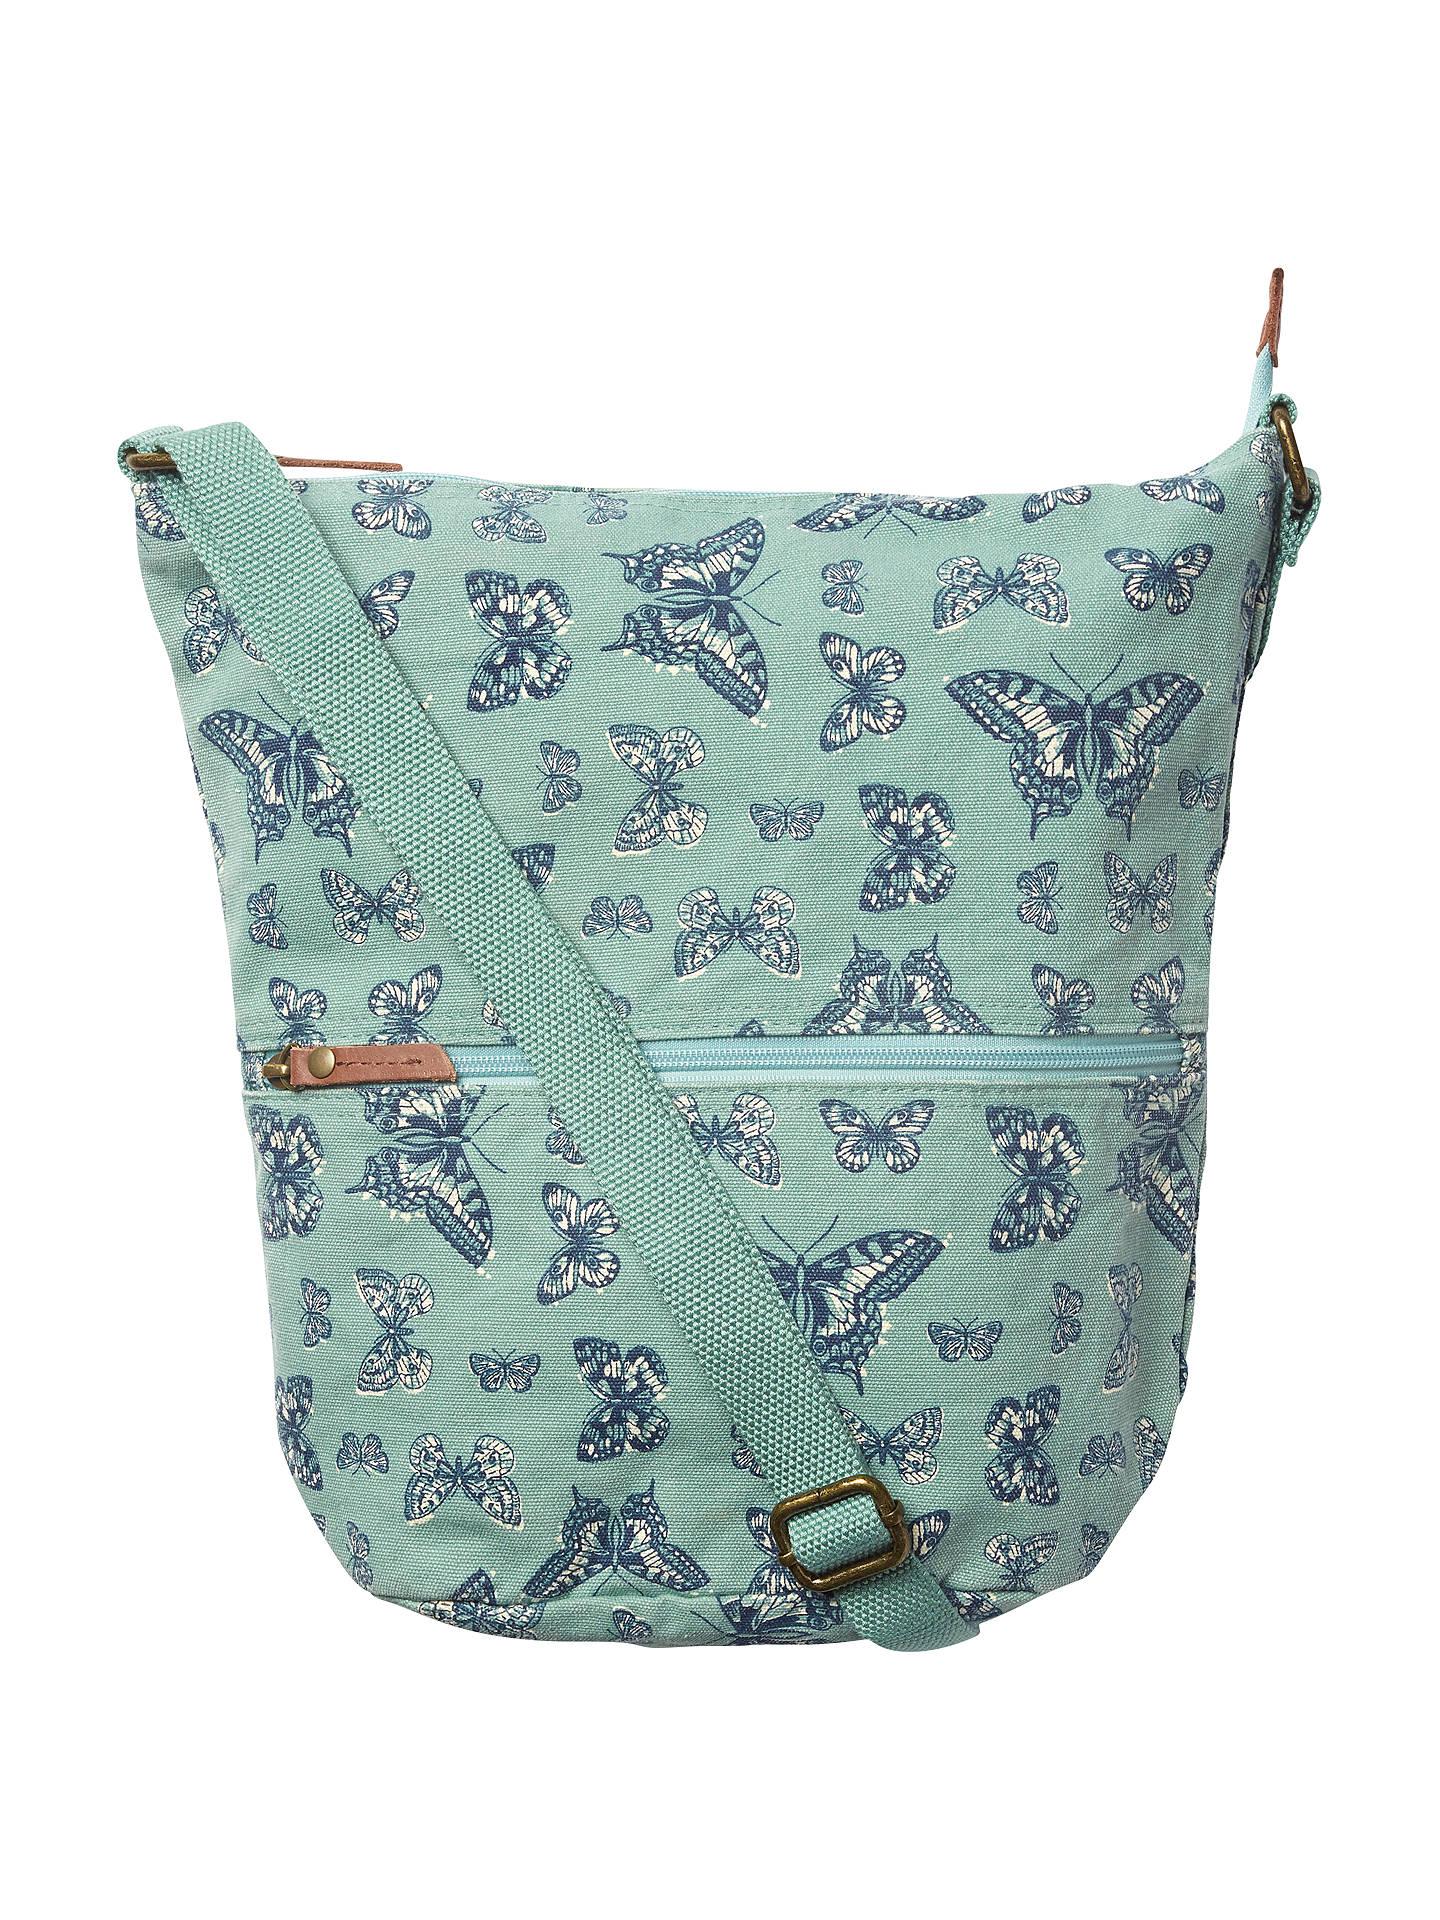 643a81d7b8f7 Buy Fat Face Mini Butterfly Canvas Cross Body Bag, Green Online at  johnlewis.com ...